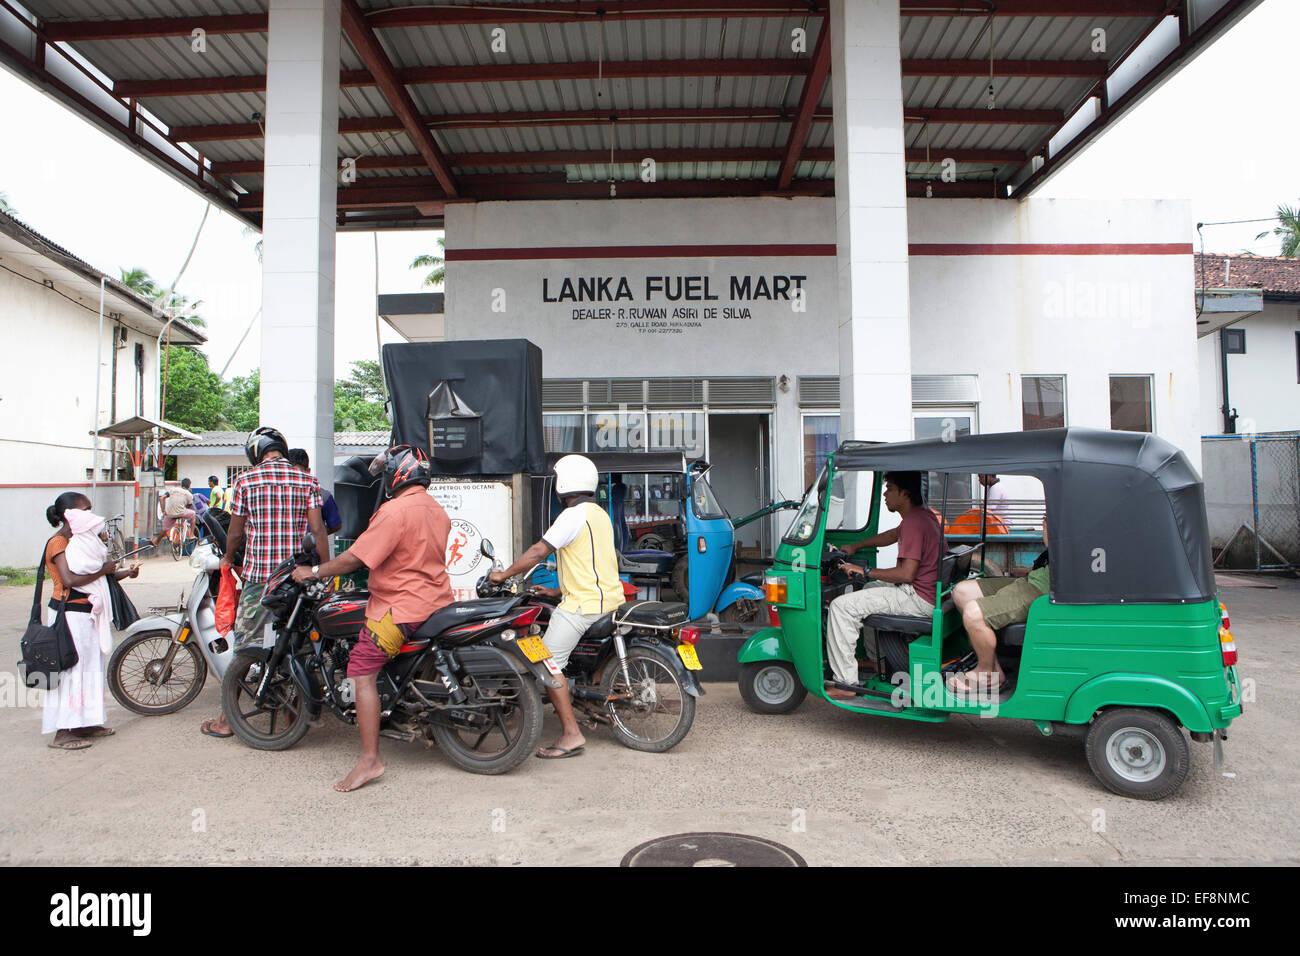 BIKES AND TUK TUK WAIT TO REFUEL AND LANKA FUEL MART - Stock Image